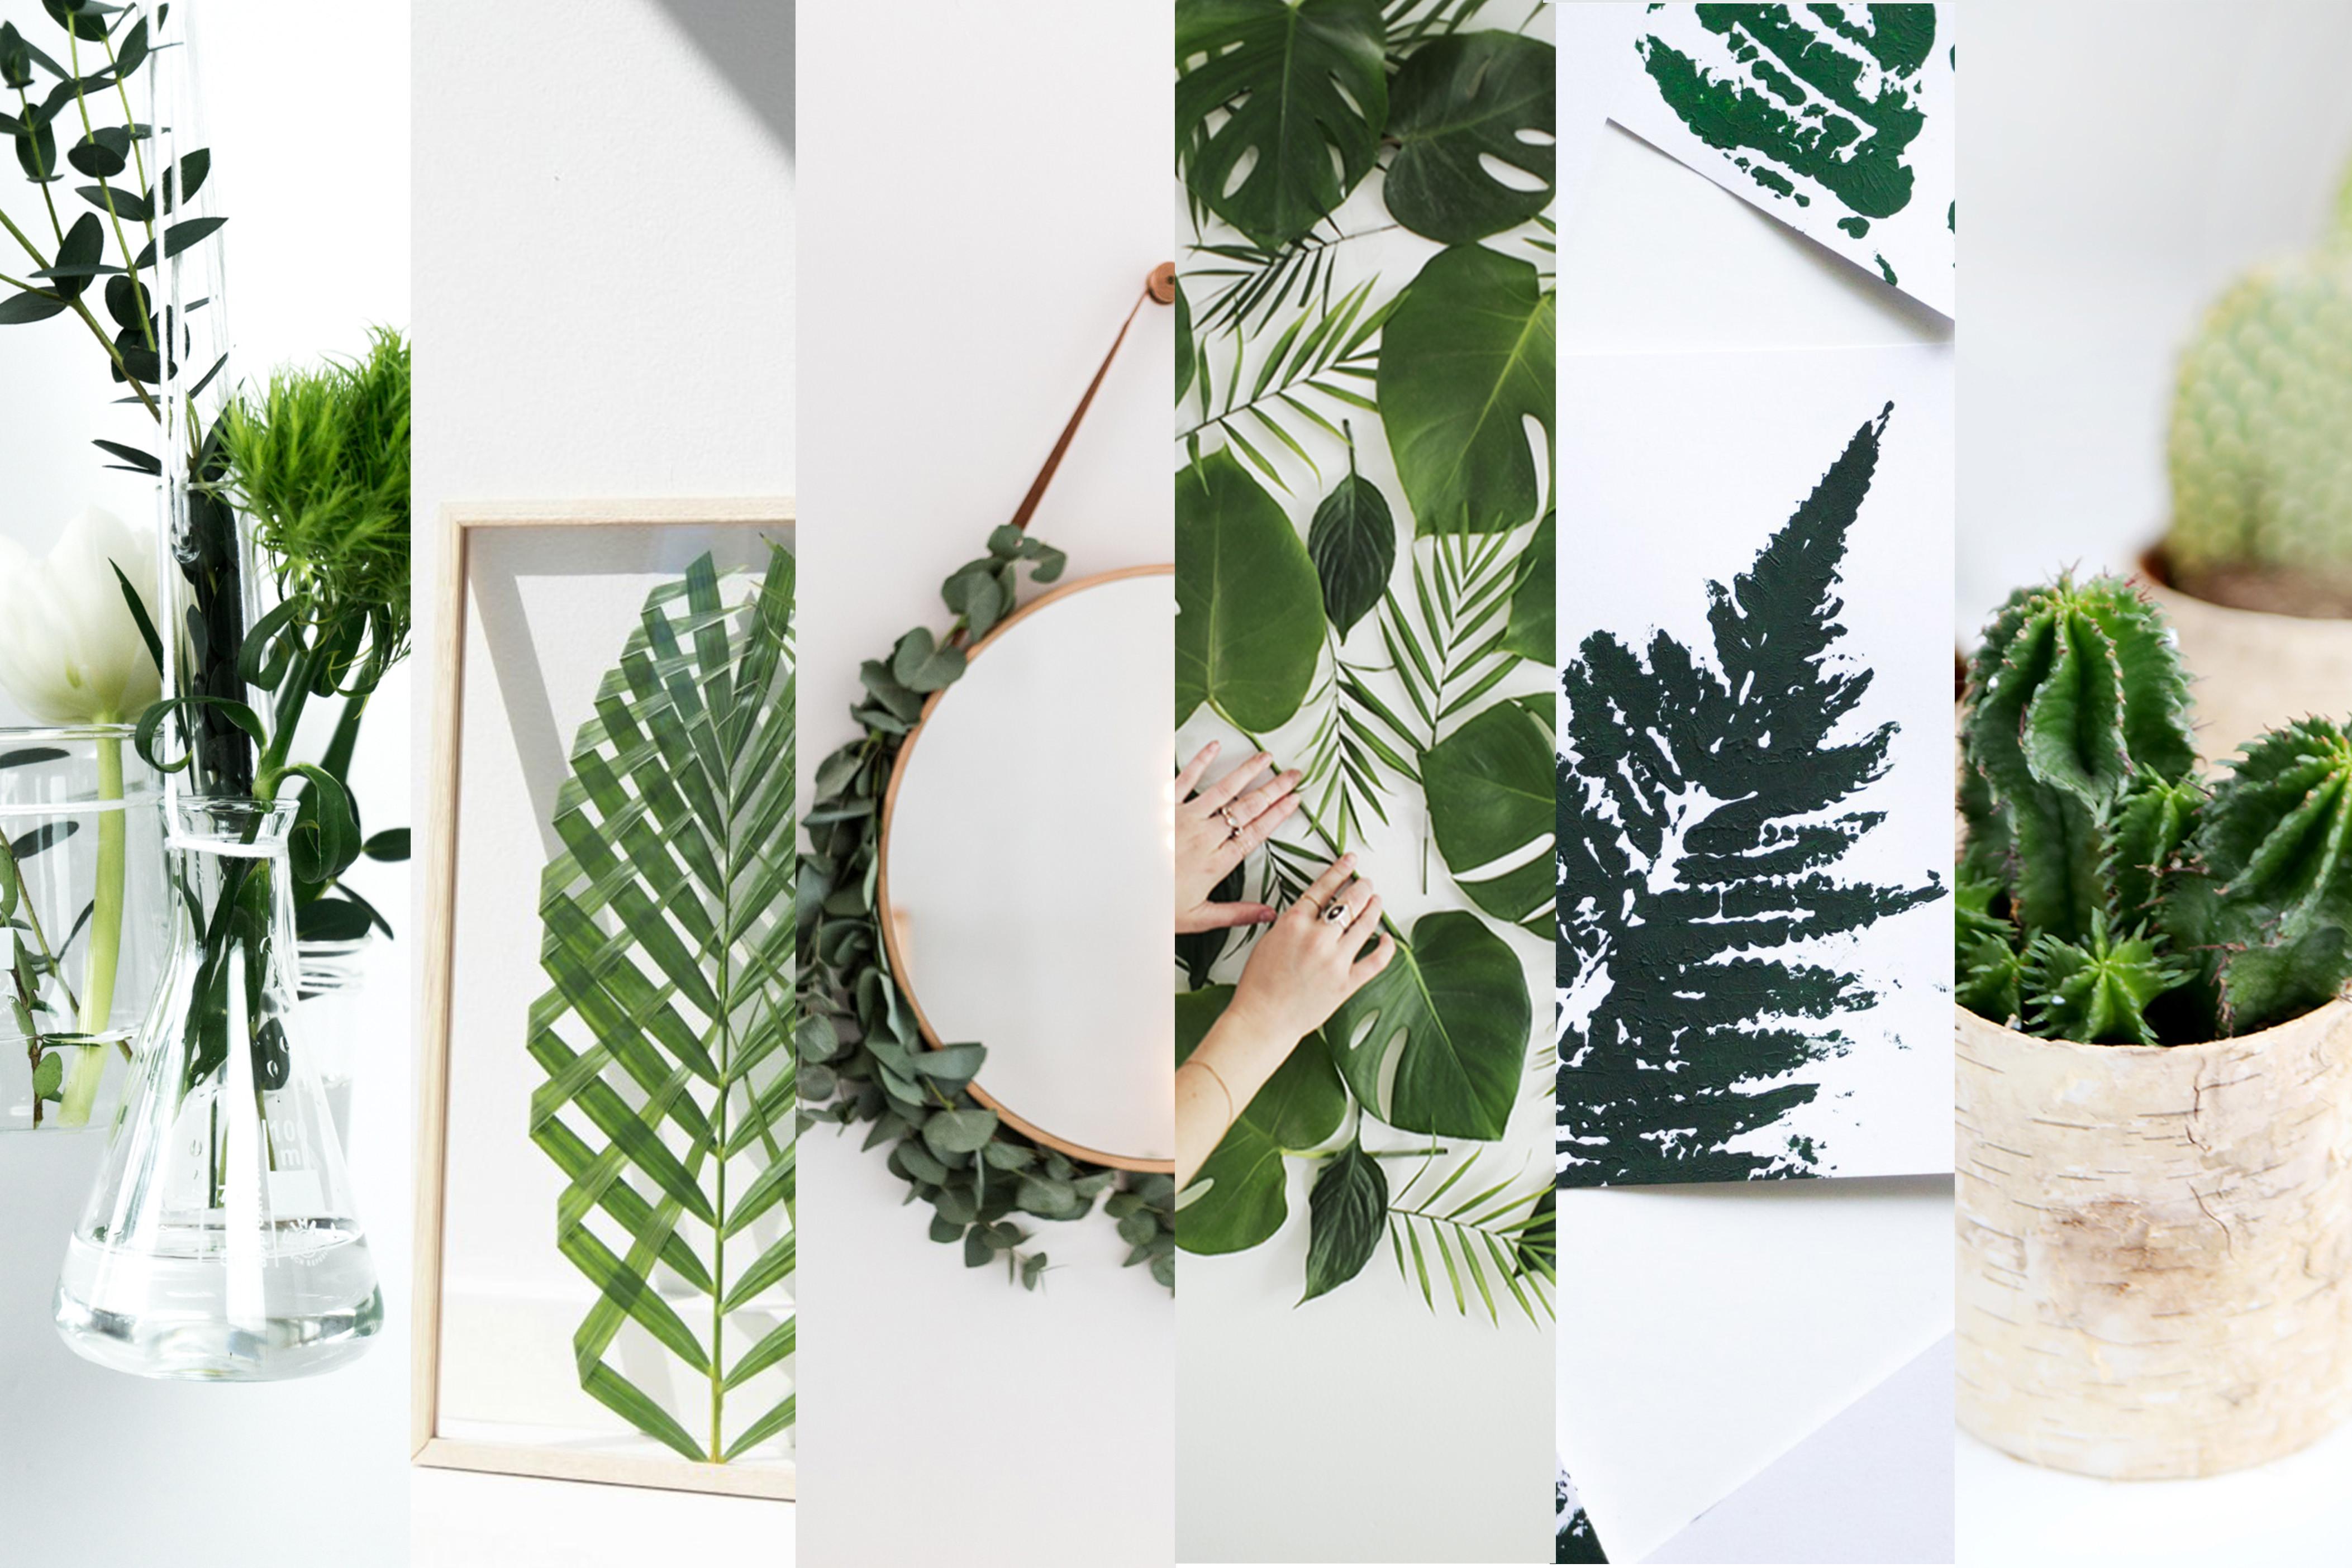 Deko Diy  6 kreative Ideen für Pflanzen Deko